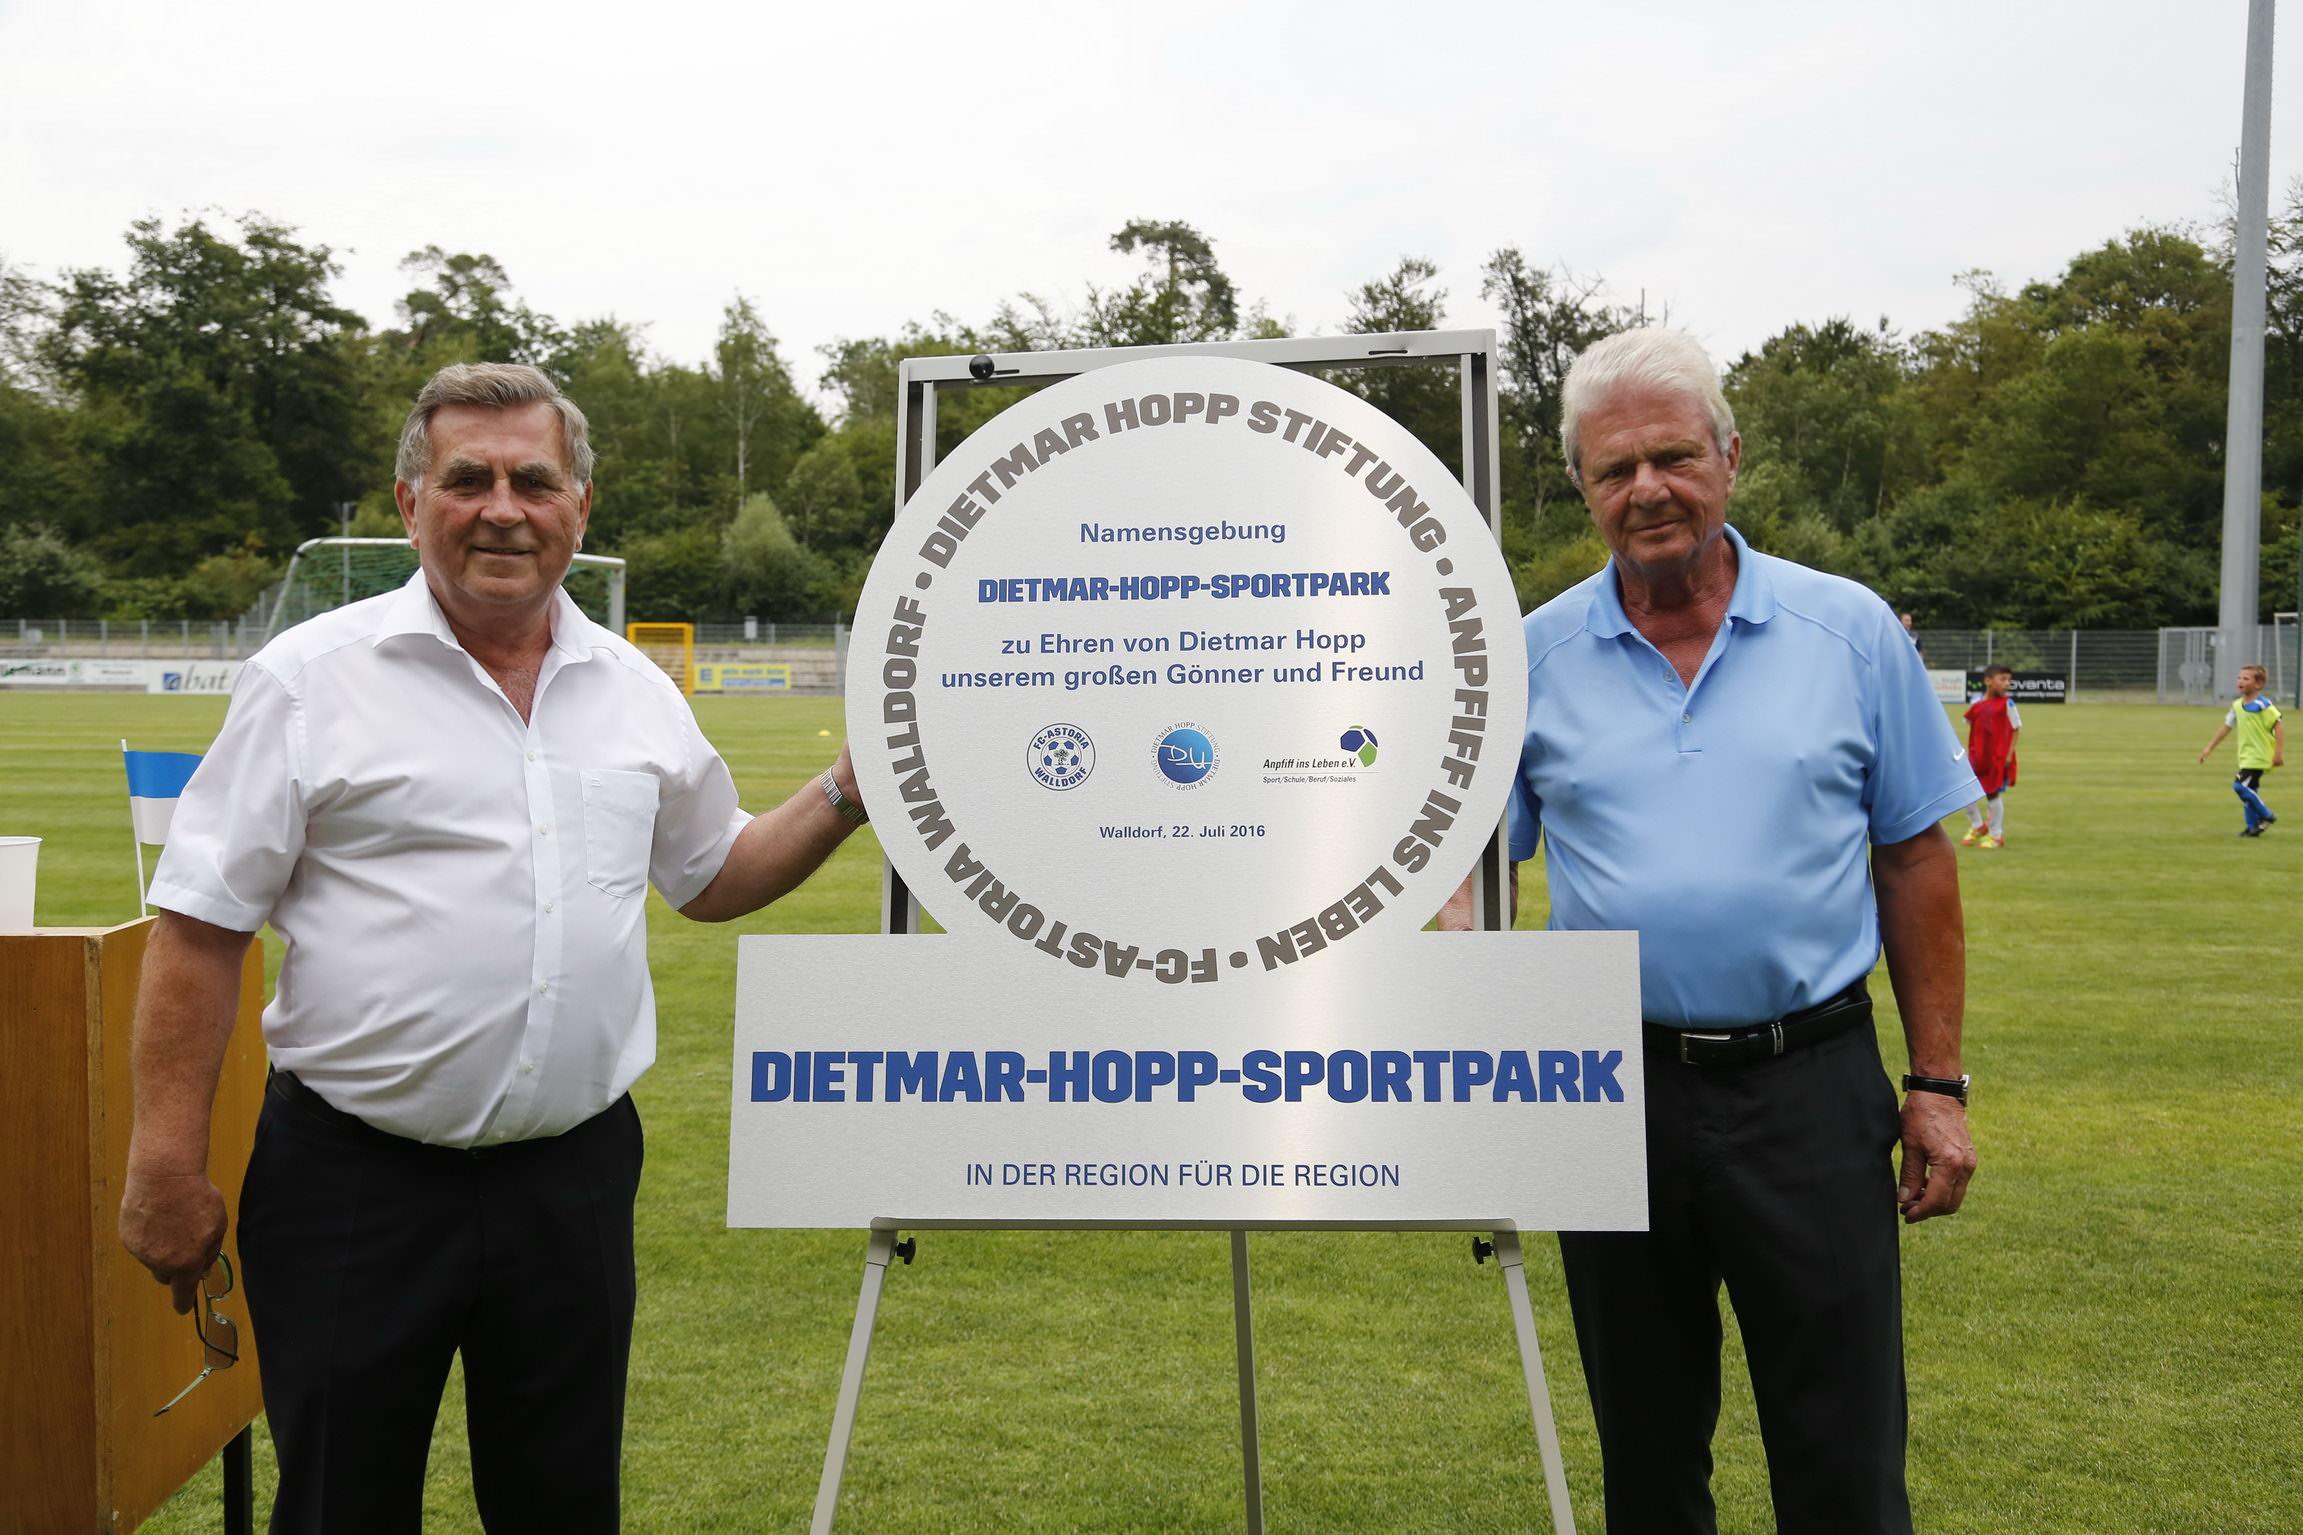 Walldorf. Namensgebung des FCA Stadions in Dietmar - Hopp Sportpark. 22.07.2016 - Helmut Pfeifer.